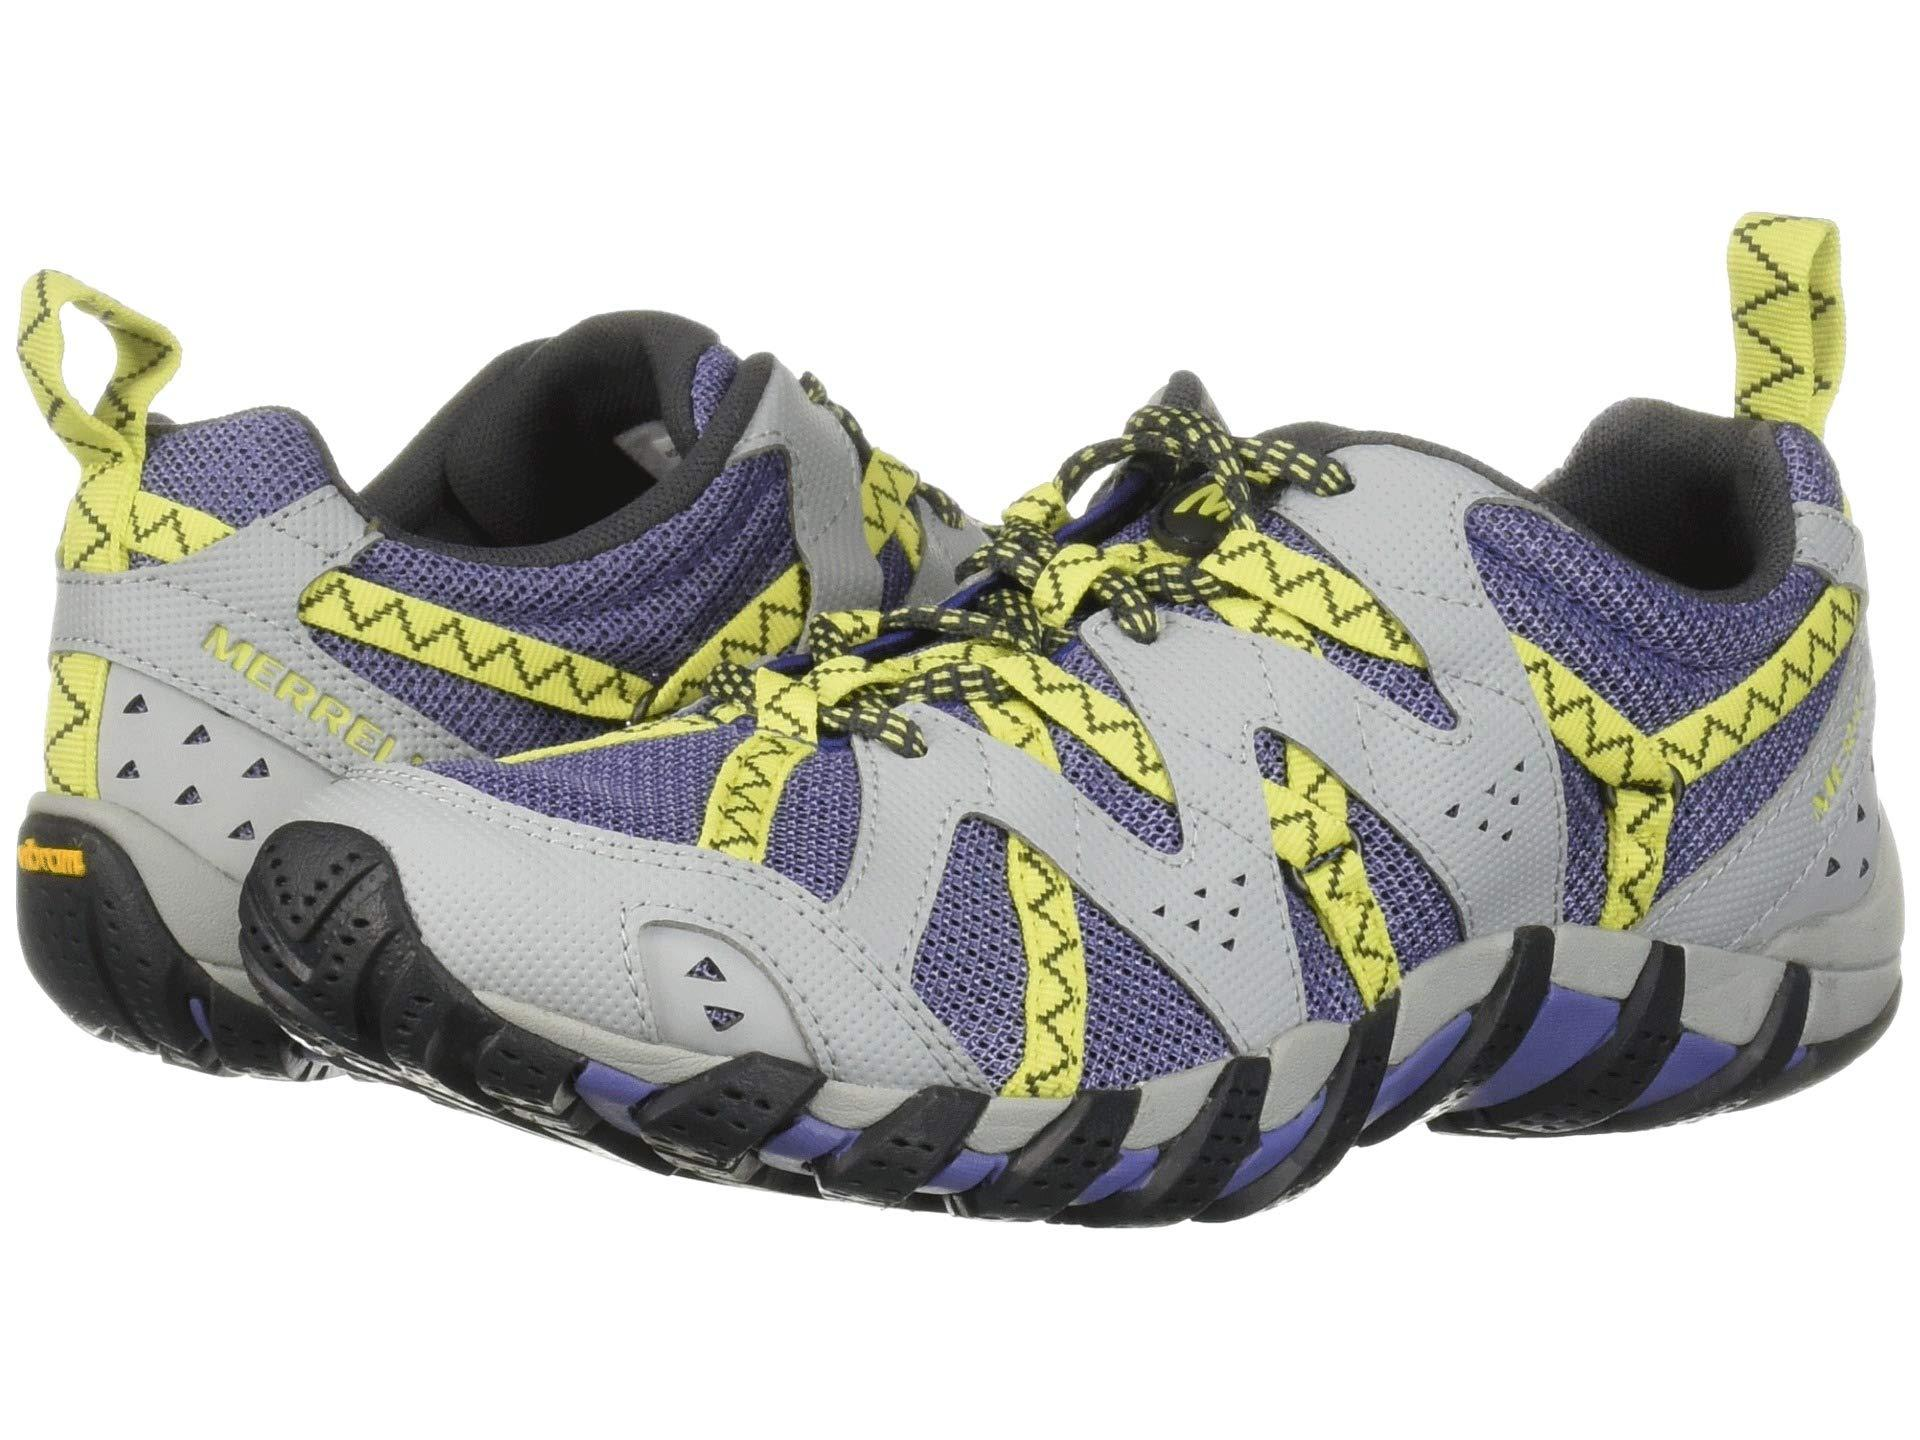 d1378601d55 Merrell - Multicolor Waterproof Maipo 2 (navy/smoke) Women's Shoes - Lyst.  View fullscreen